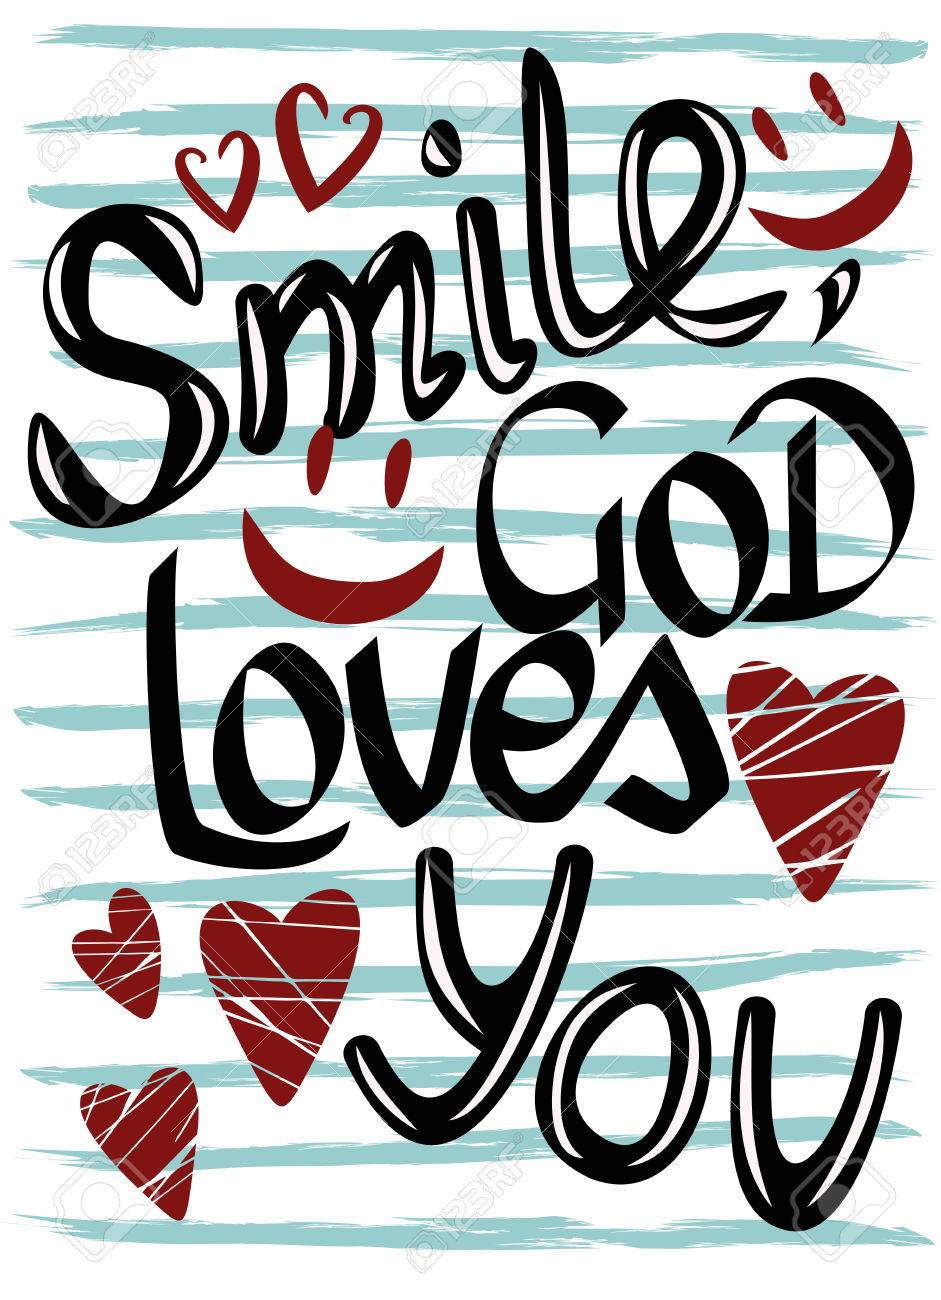 Smile of god